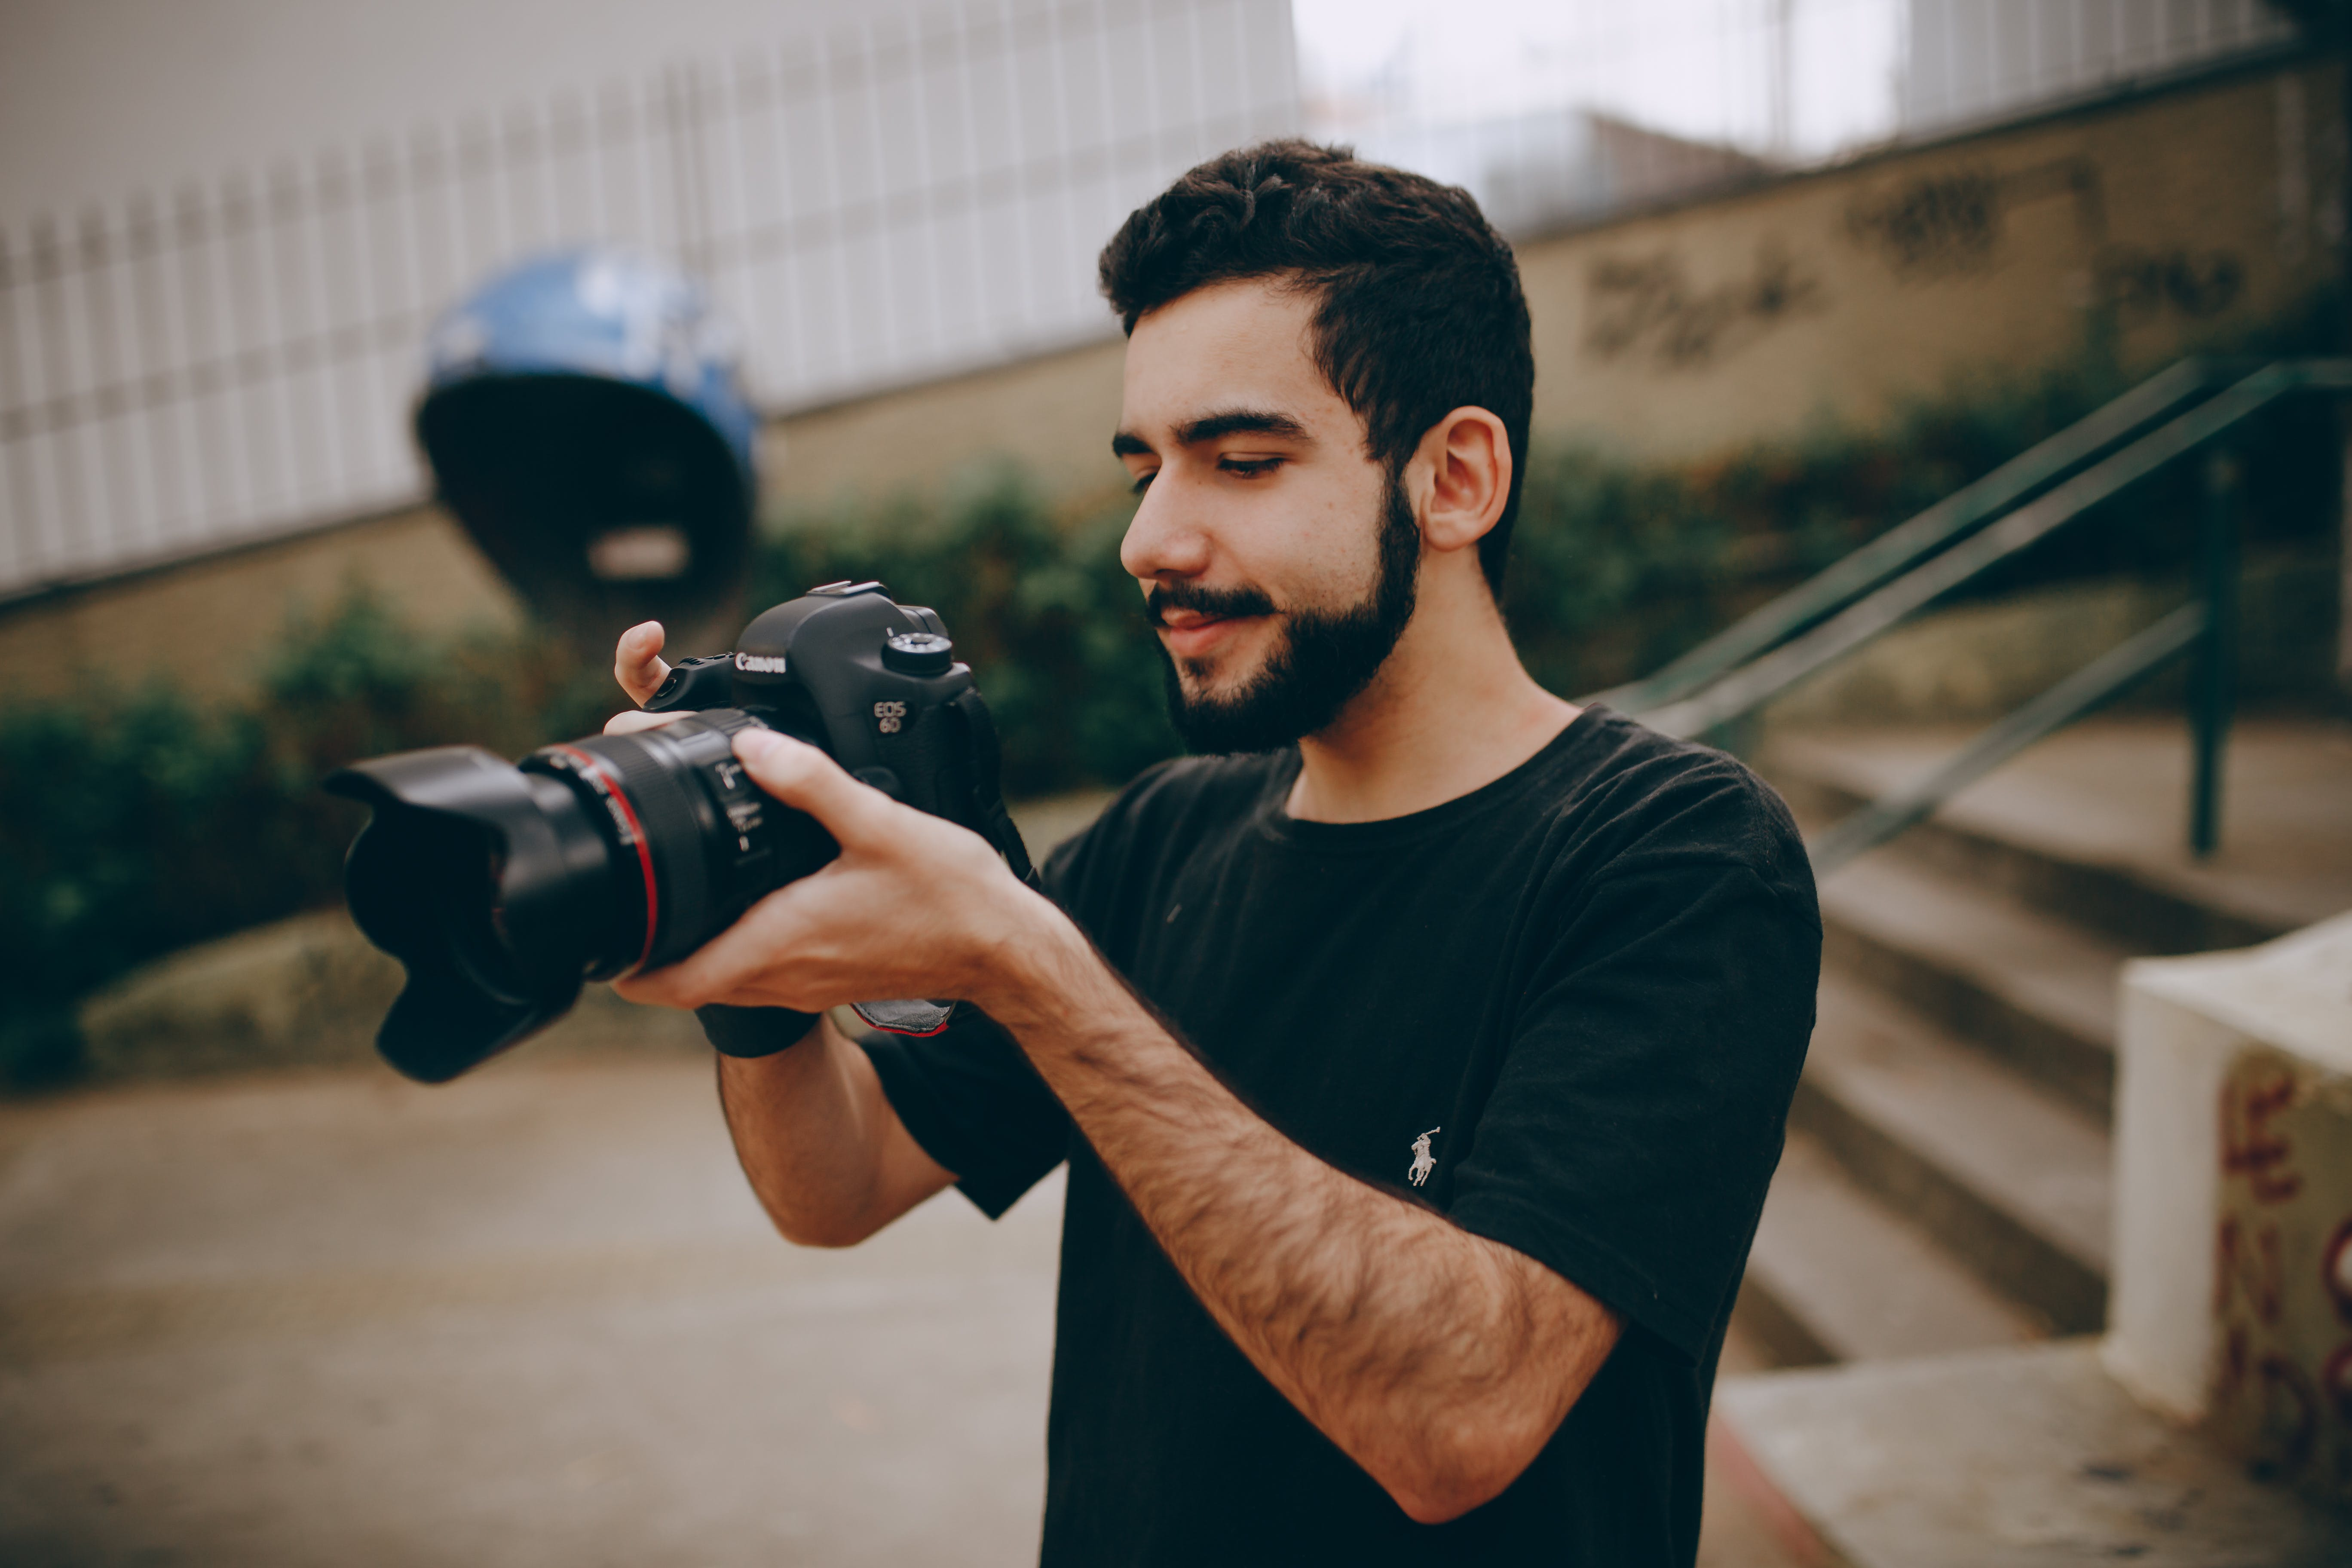 Photo of Man Taking Photo Using a Dslr Camera